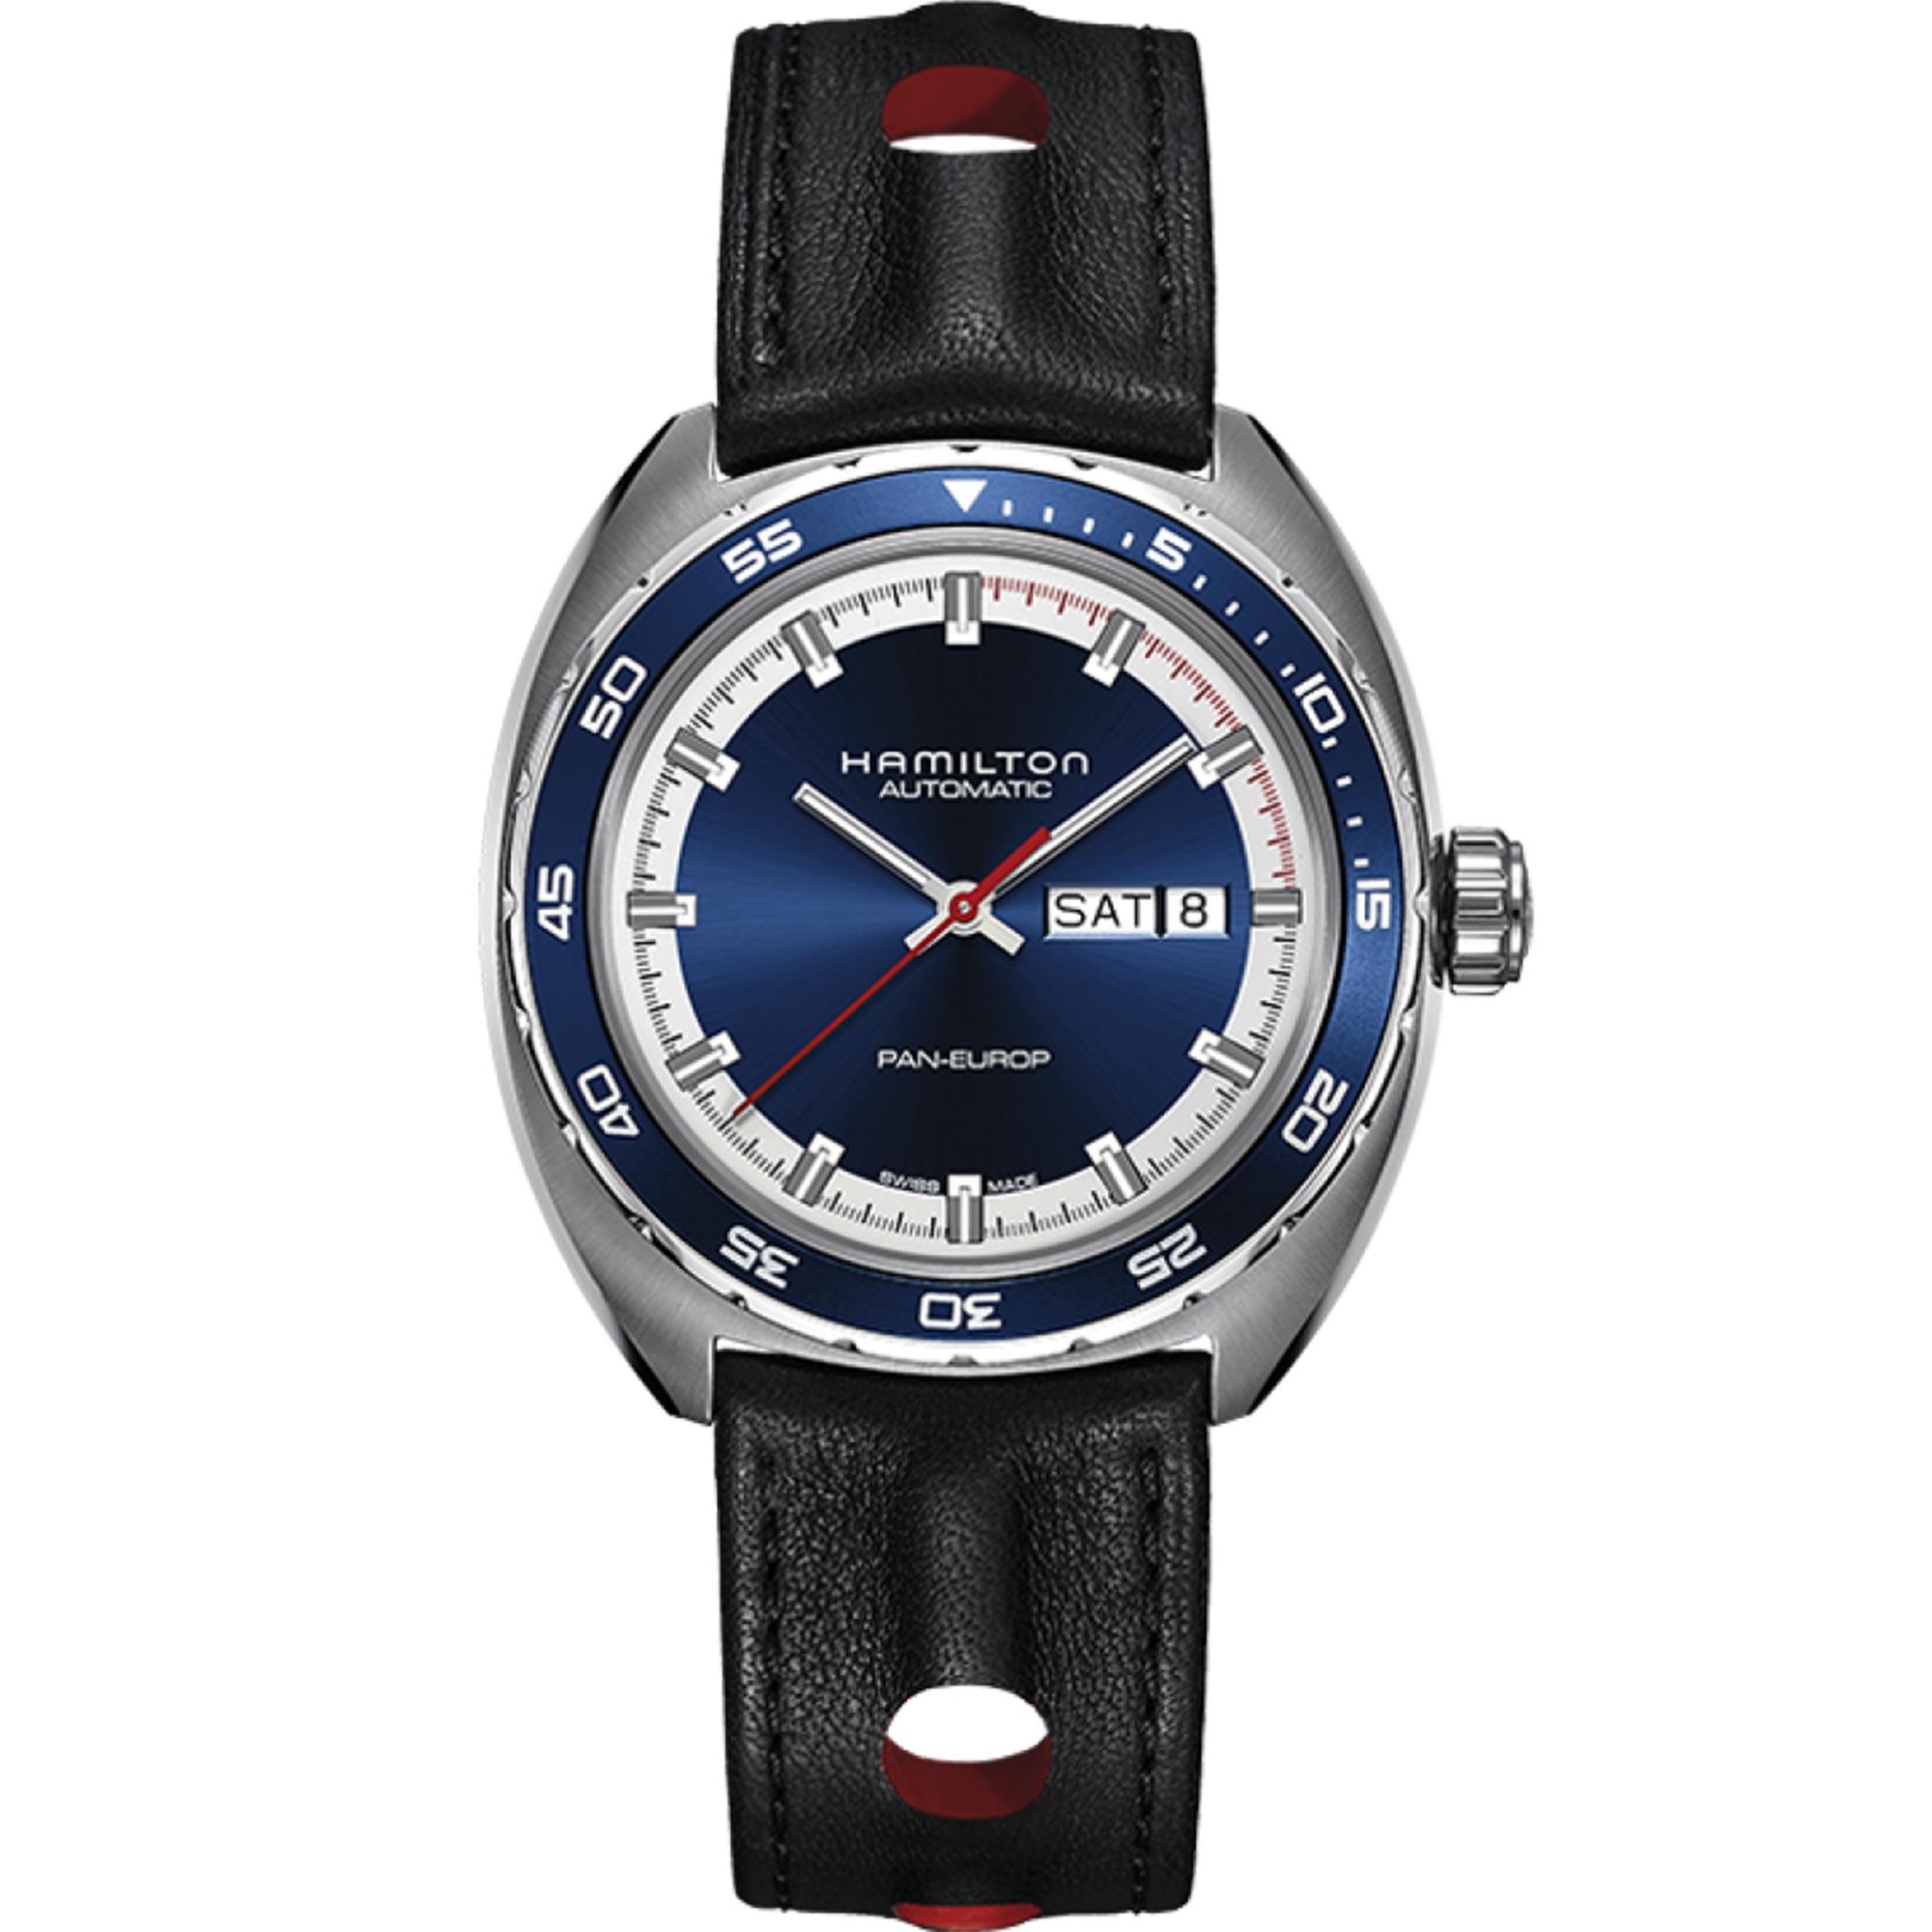 Hamilton Pan Europ Auto American Classic Black Leather Strap Blue Dial Men's Watch H35405741